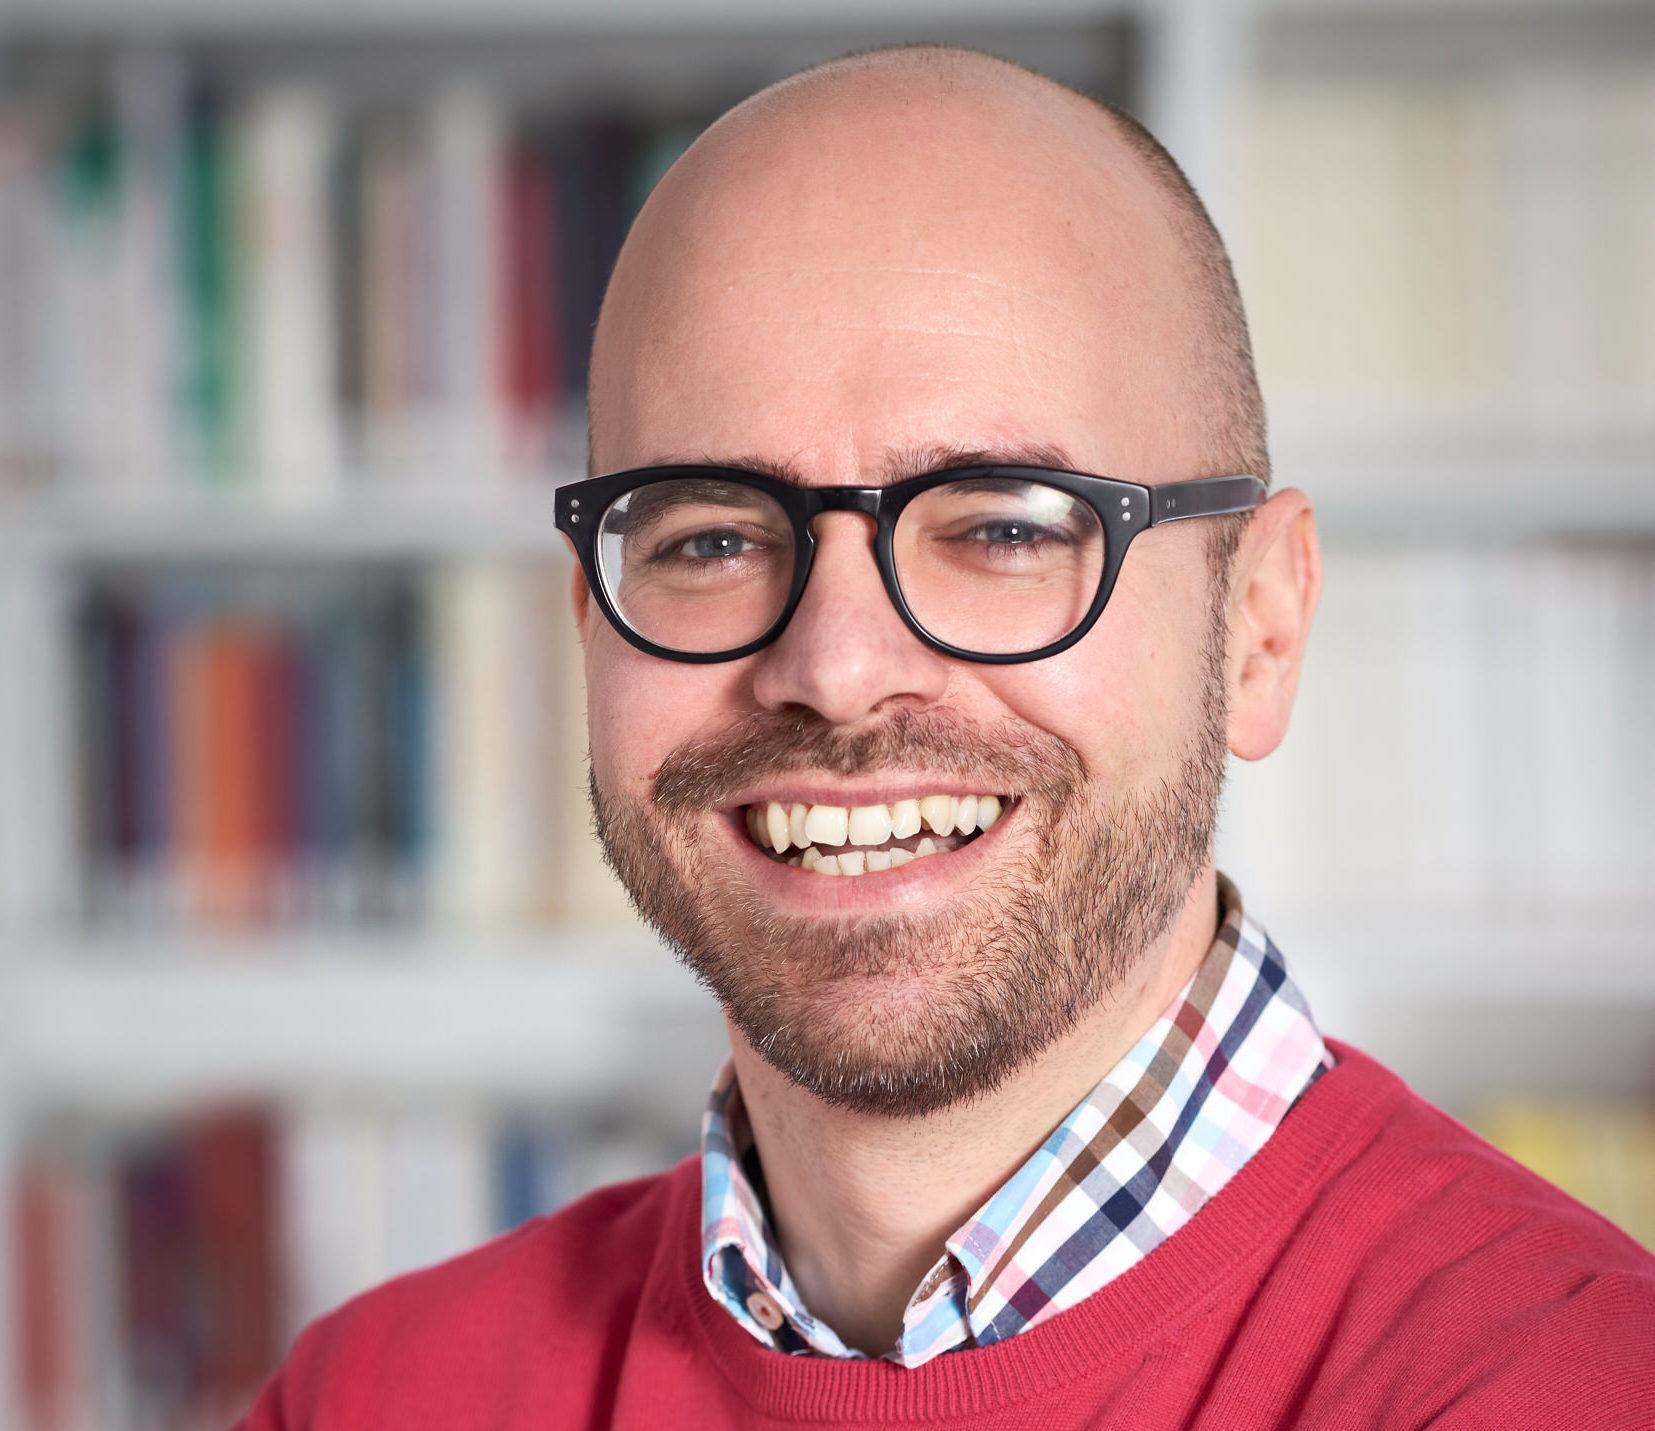 Josef Lentsch, Director Neos Lab